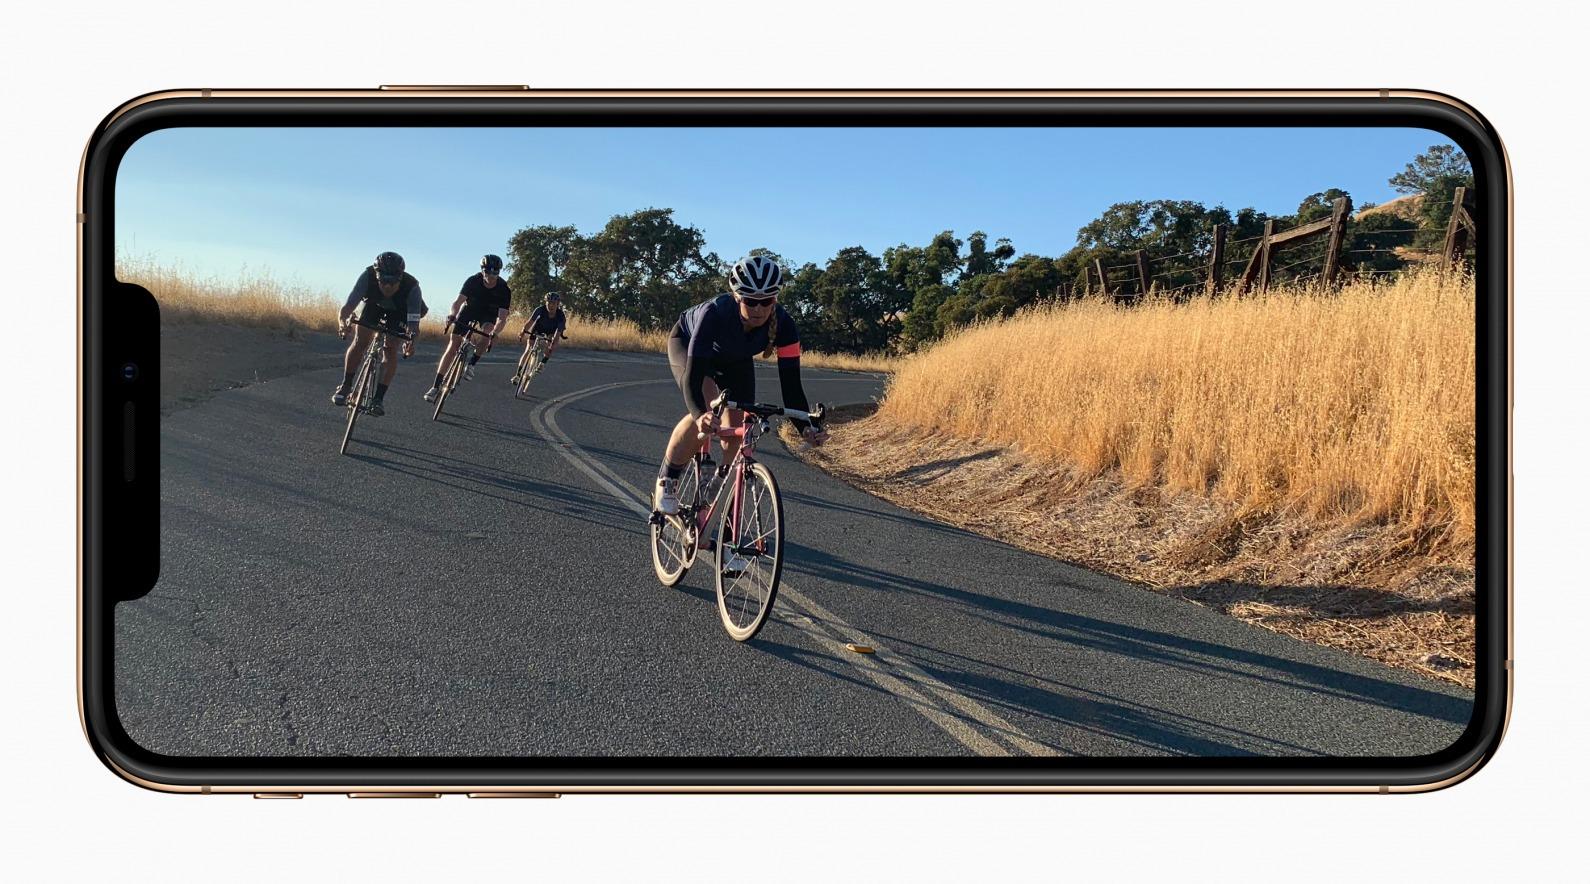 iphone camera quality